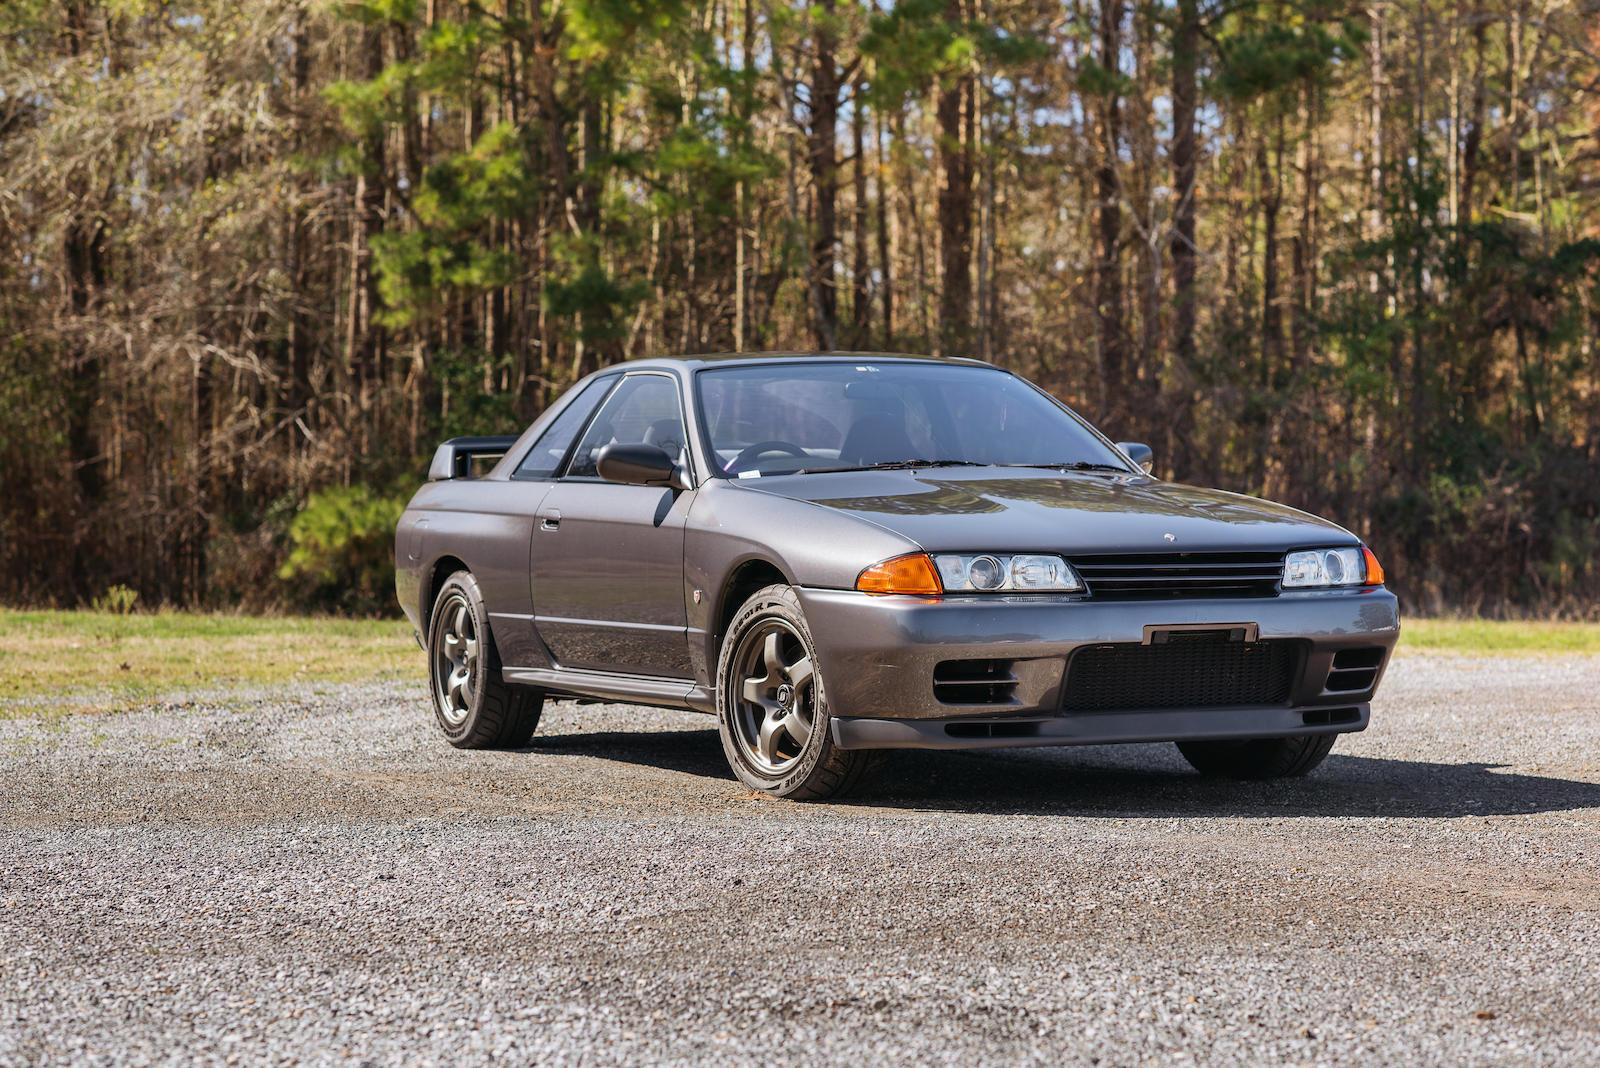 1989 Nissan Skyline R32 GT-R